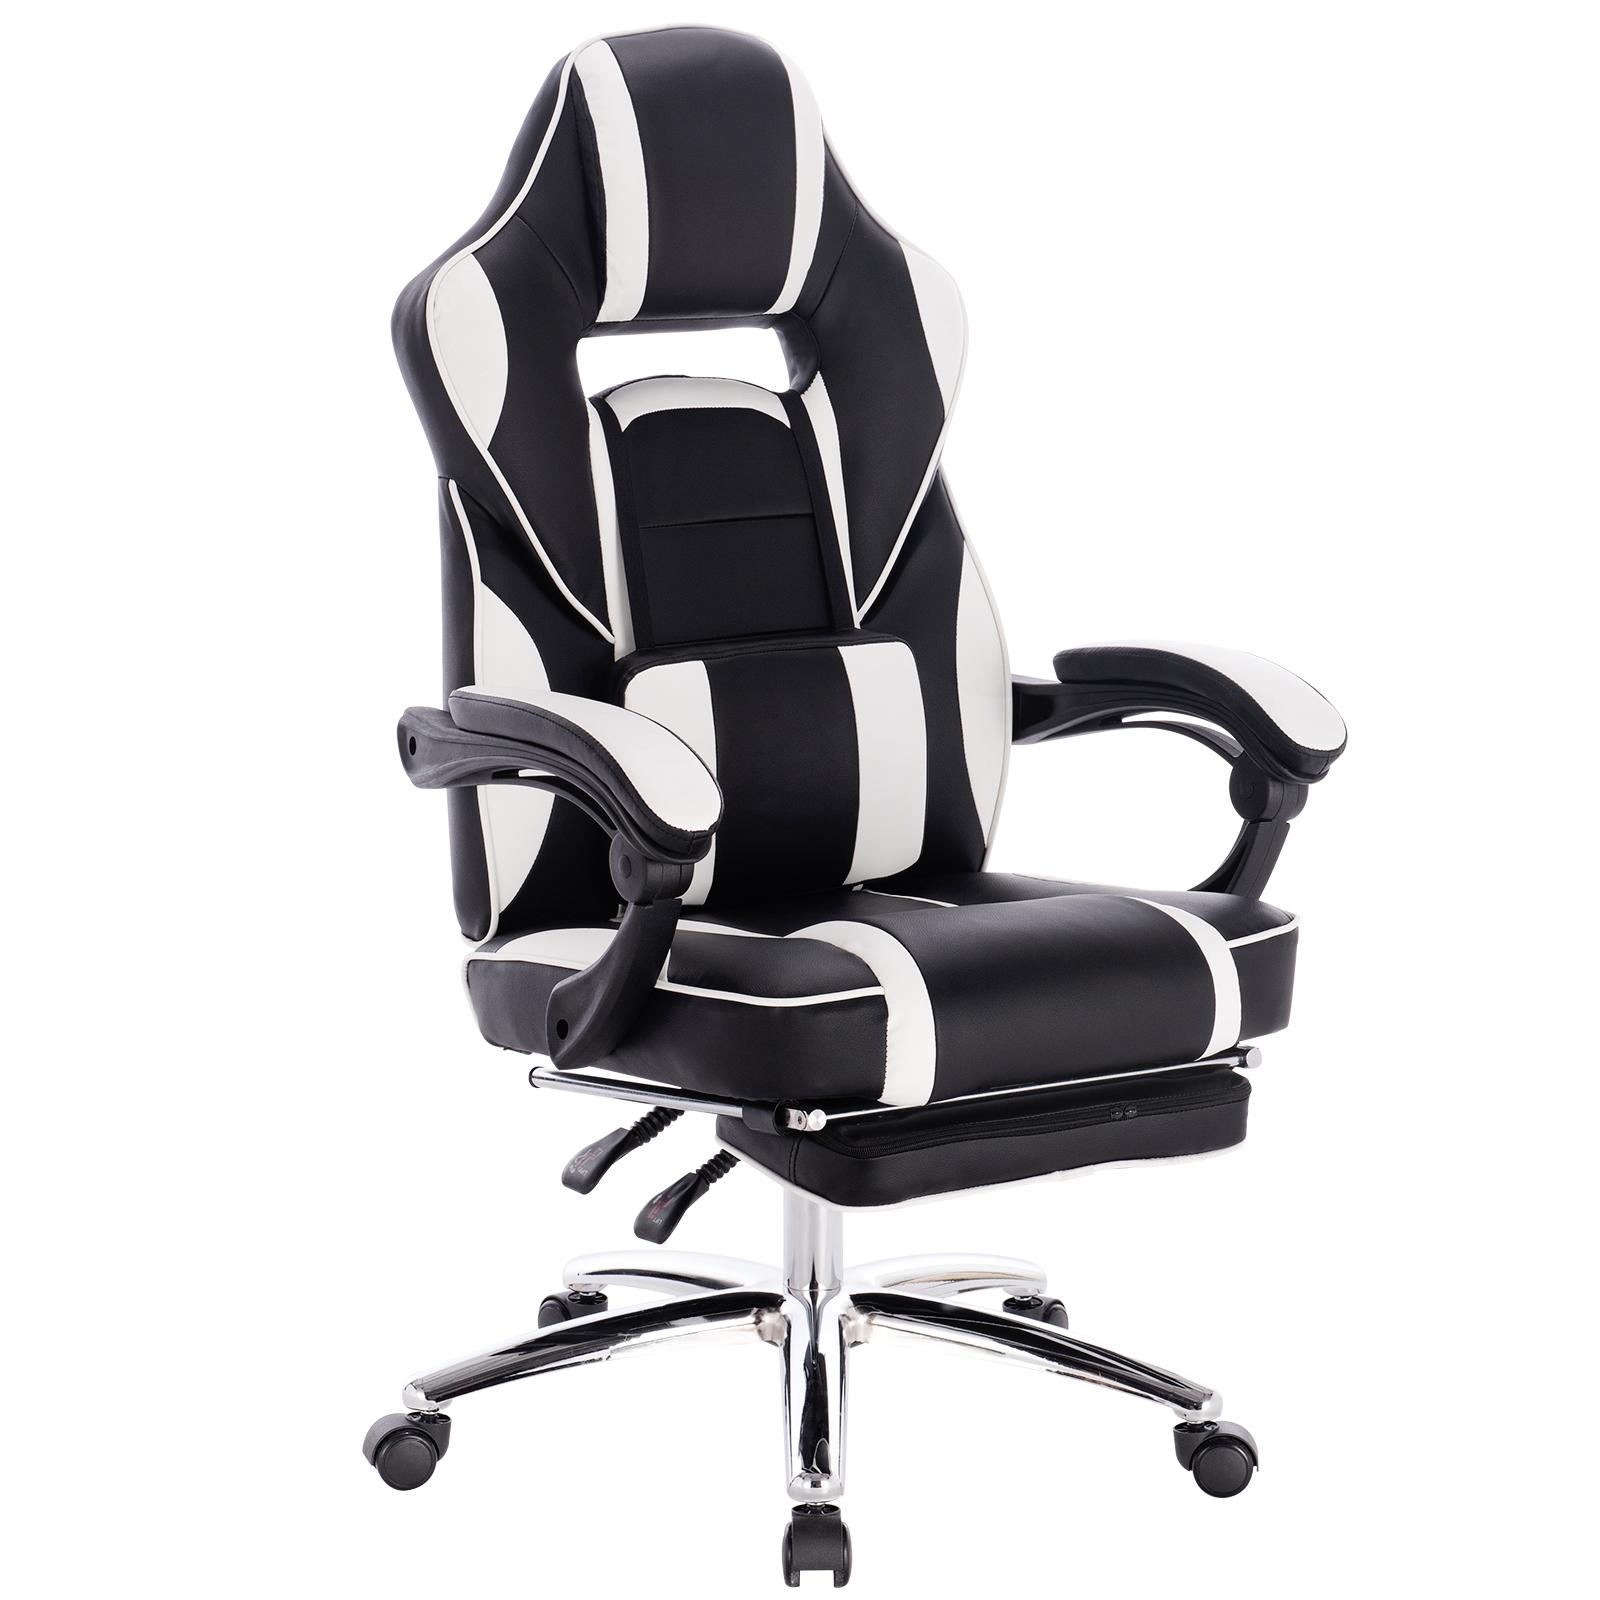 gaming stuhl racing stuhl b rostuhl drehstuhl sportsitz. Black Bedroom Furniture Sets. Home Design Ideas